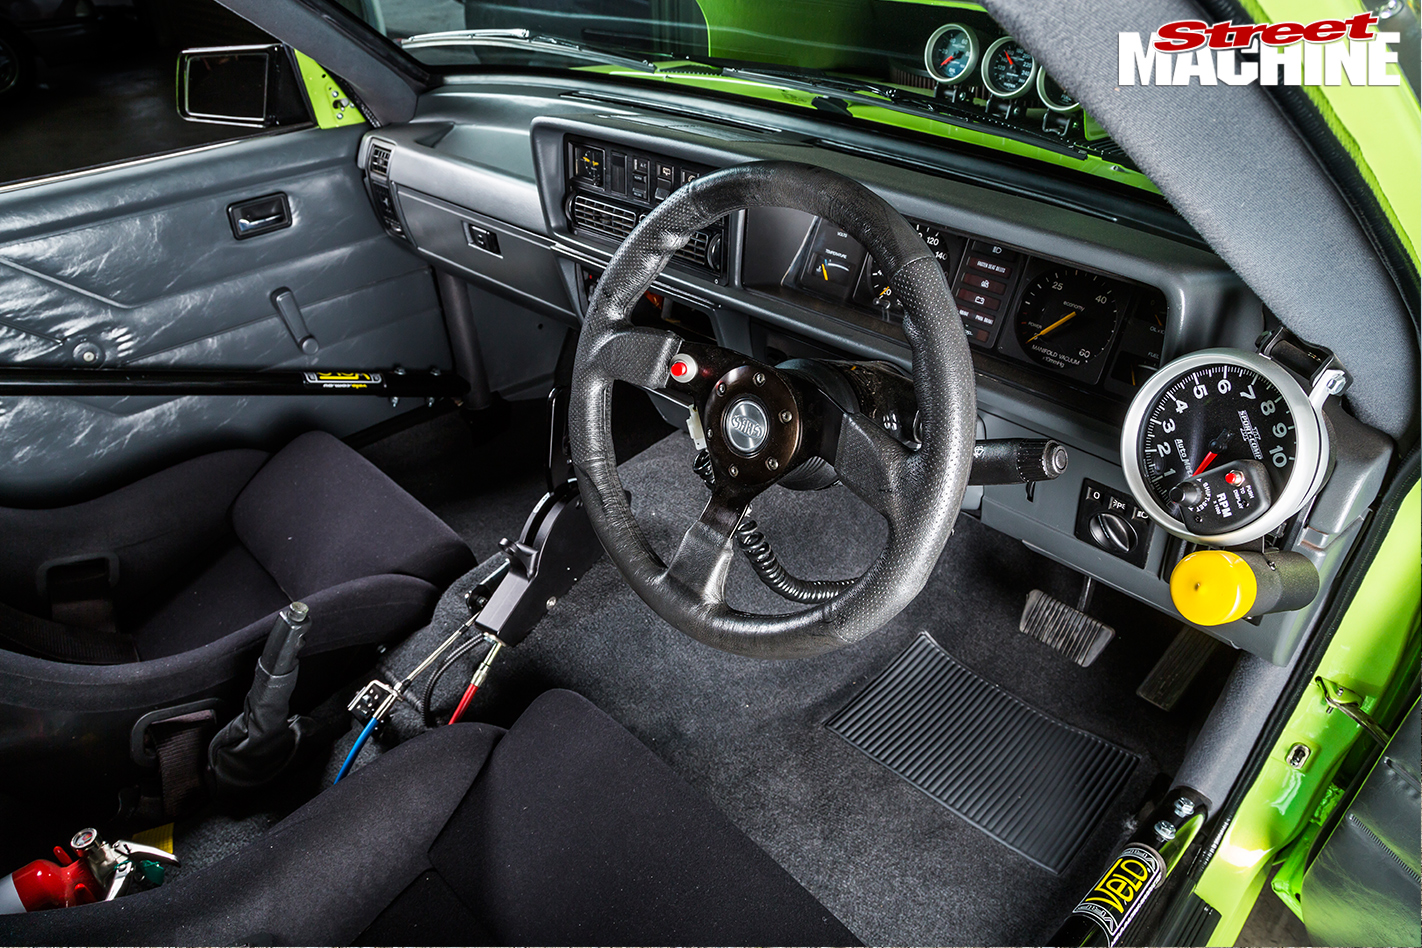 Holden -VH-Vacationer -Wagon -interior -dash